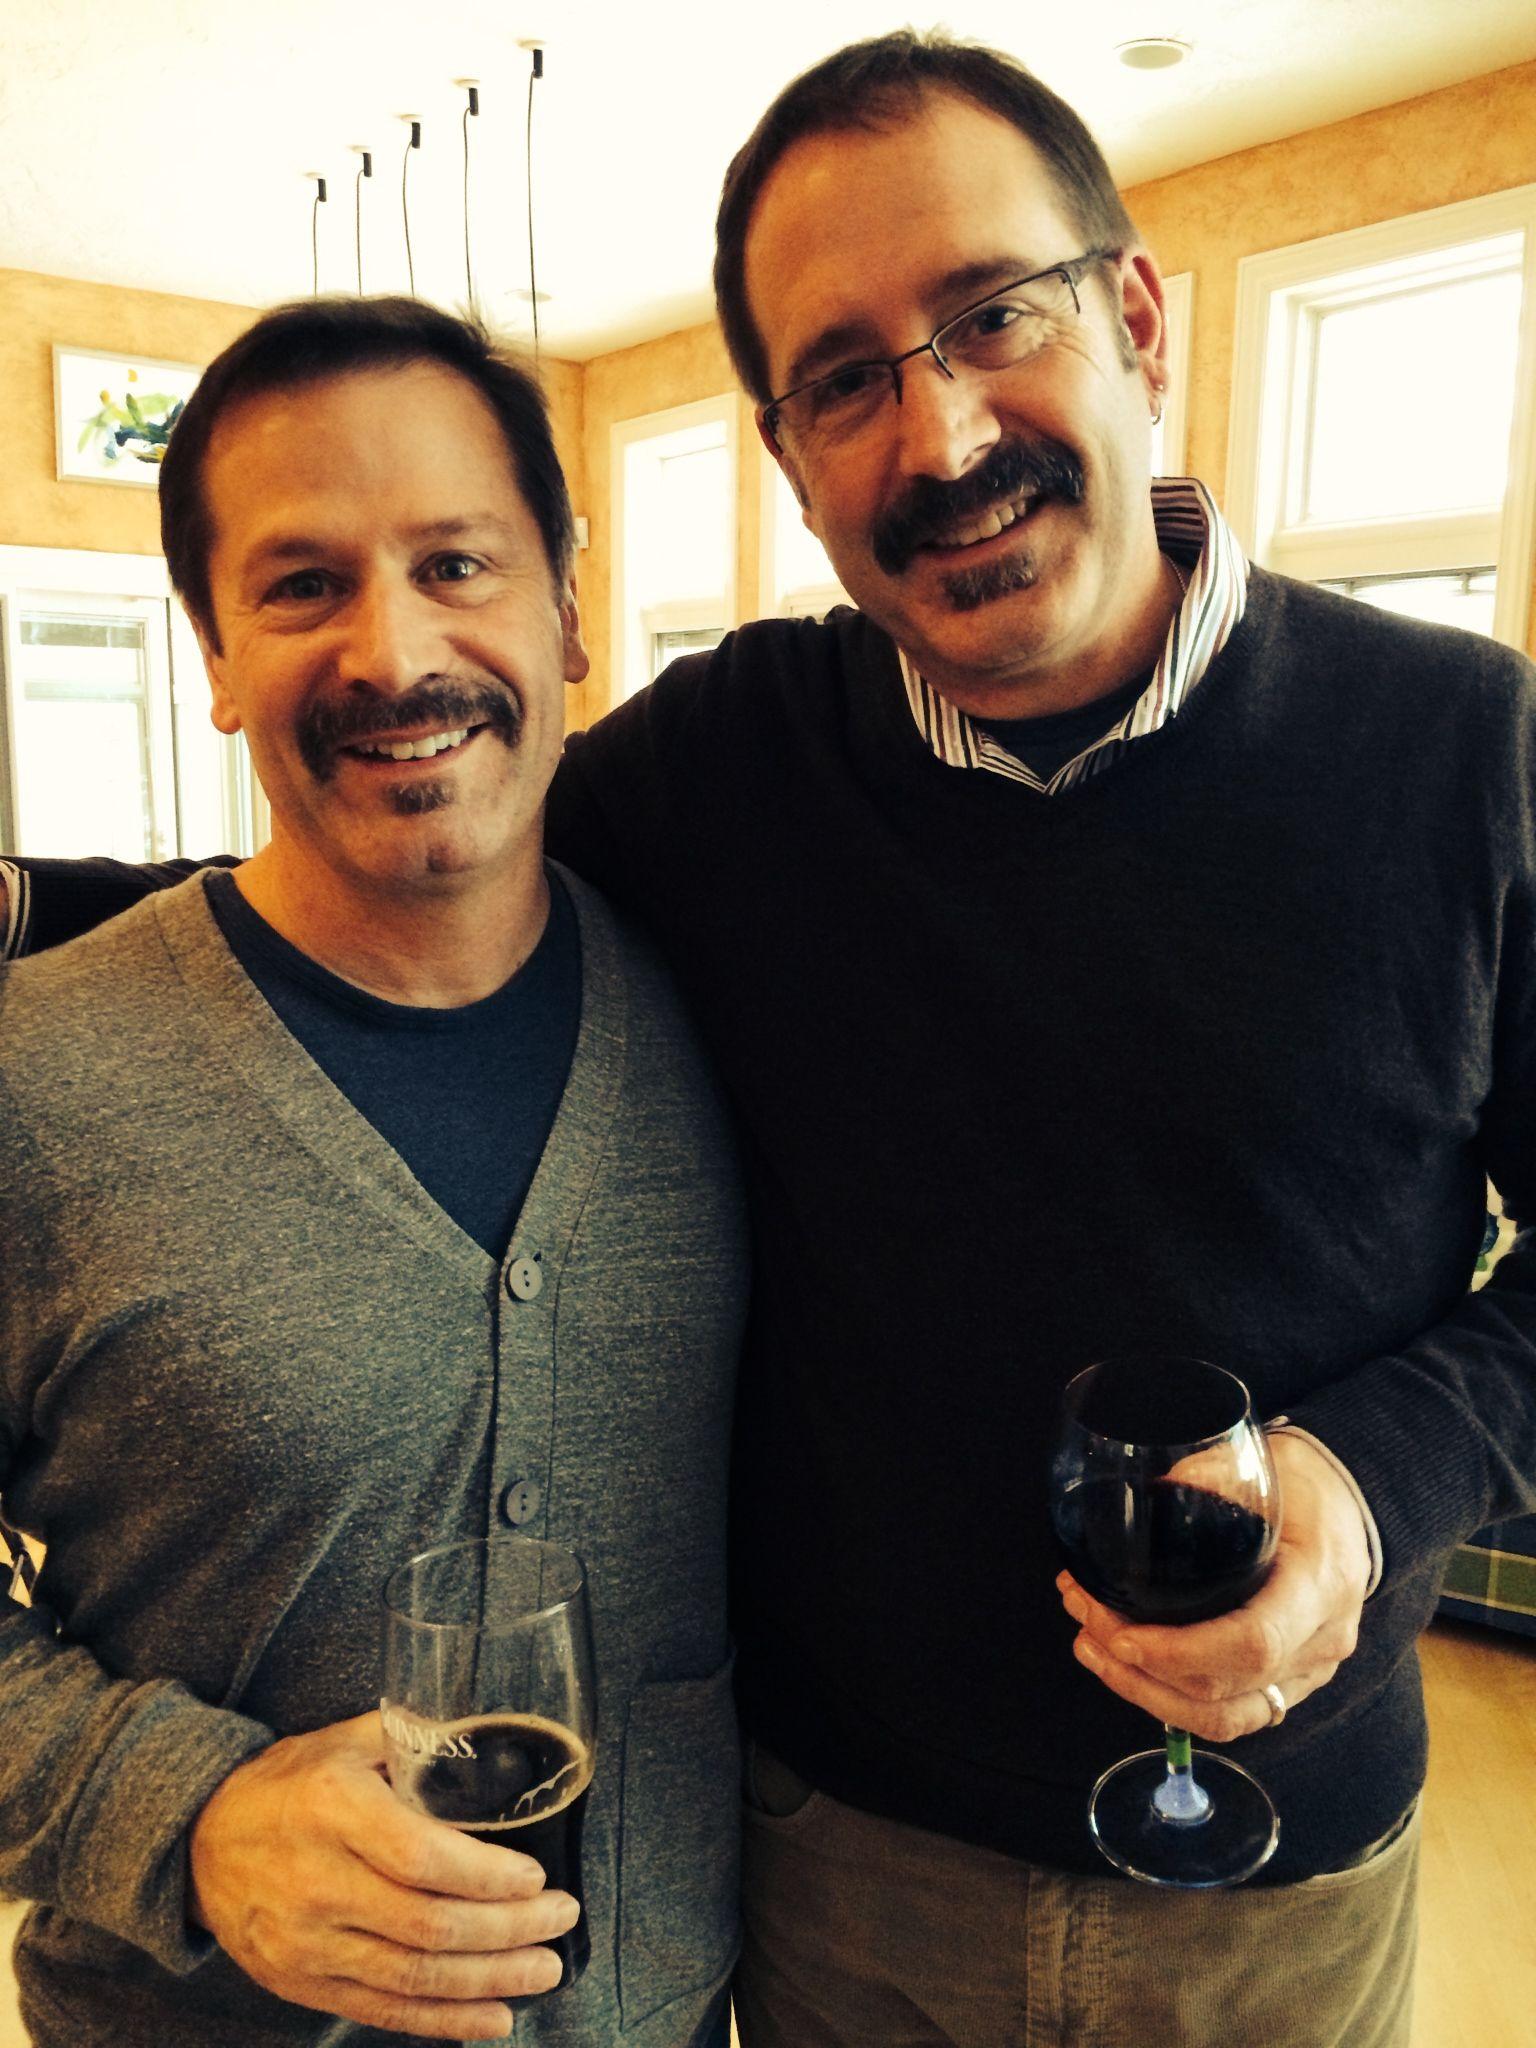 Steve and Scott Schmidt